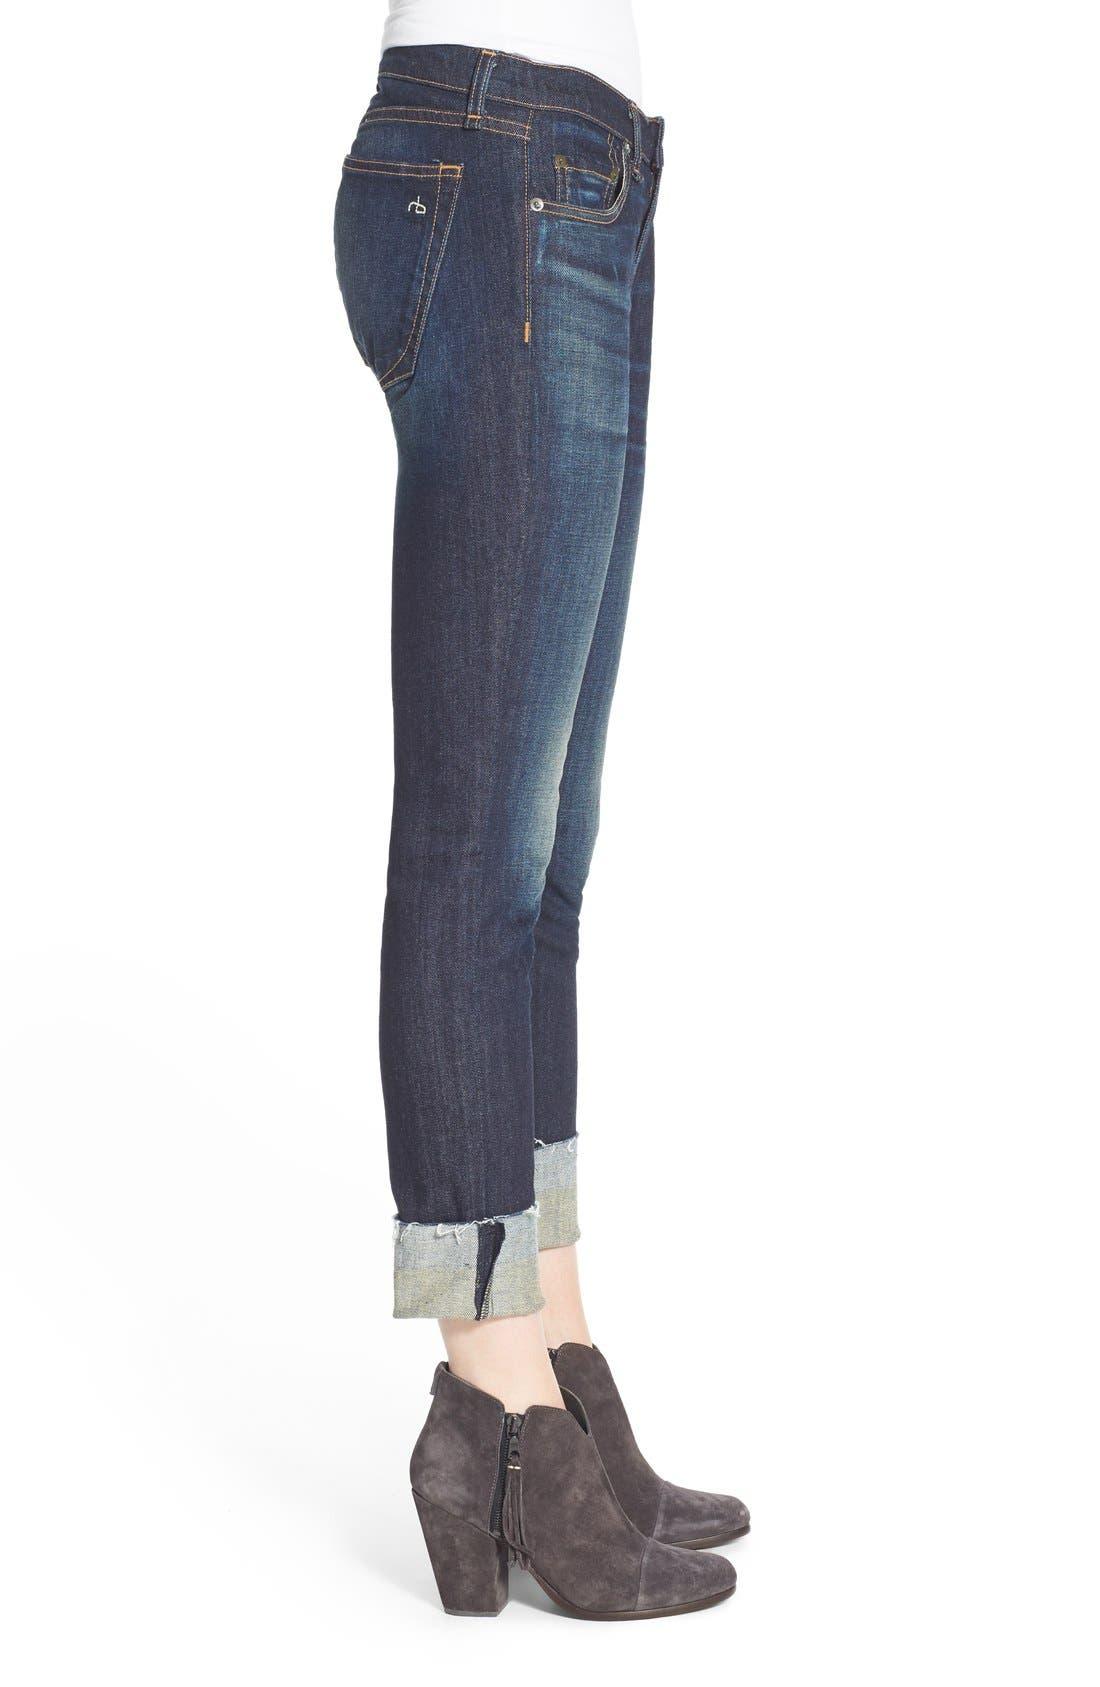 Alternate Image 4  - rag & bone/JEAN 'The Dre' Slim Fit Boyfriend Jeans (Yesler)